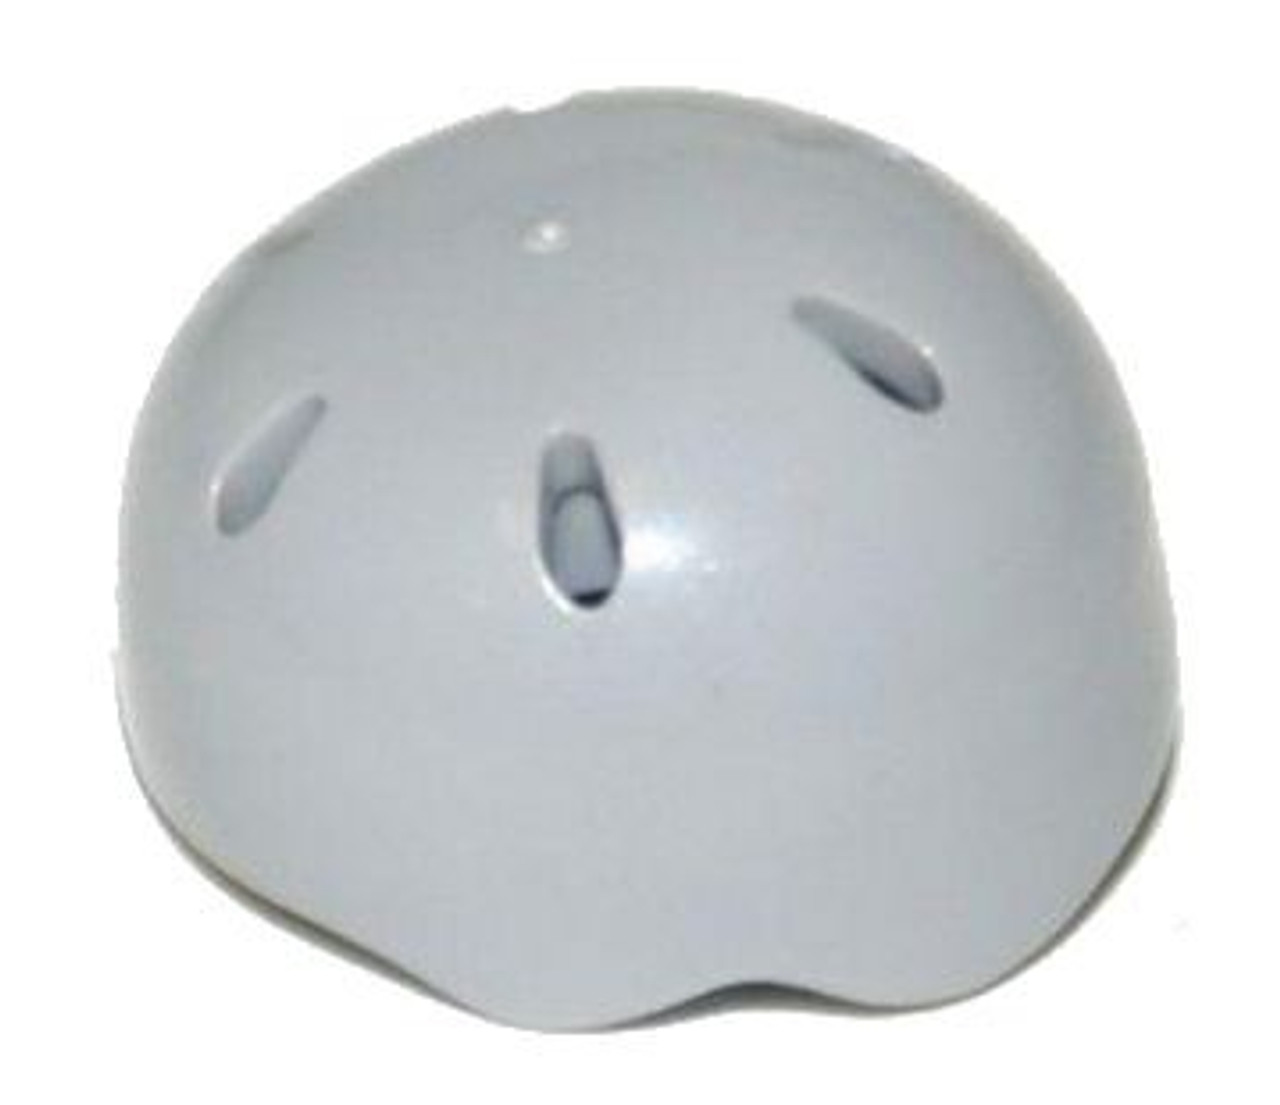 133cdb19 LEGO City Headgear Light Gray Bike Helmet Loose - ToyWiz